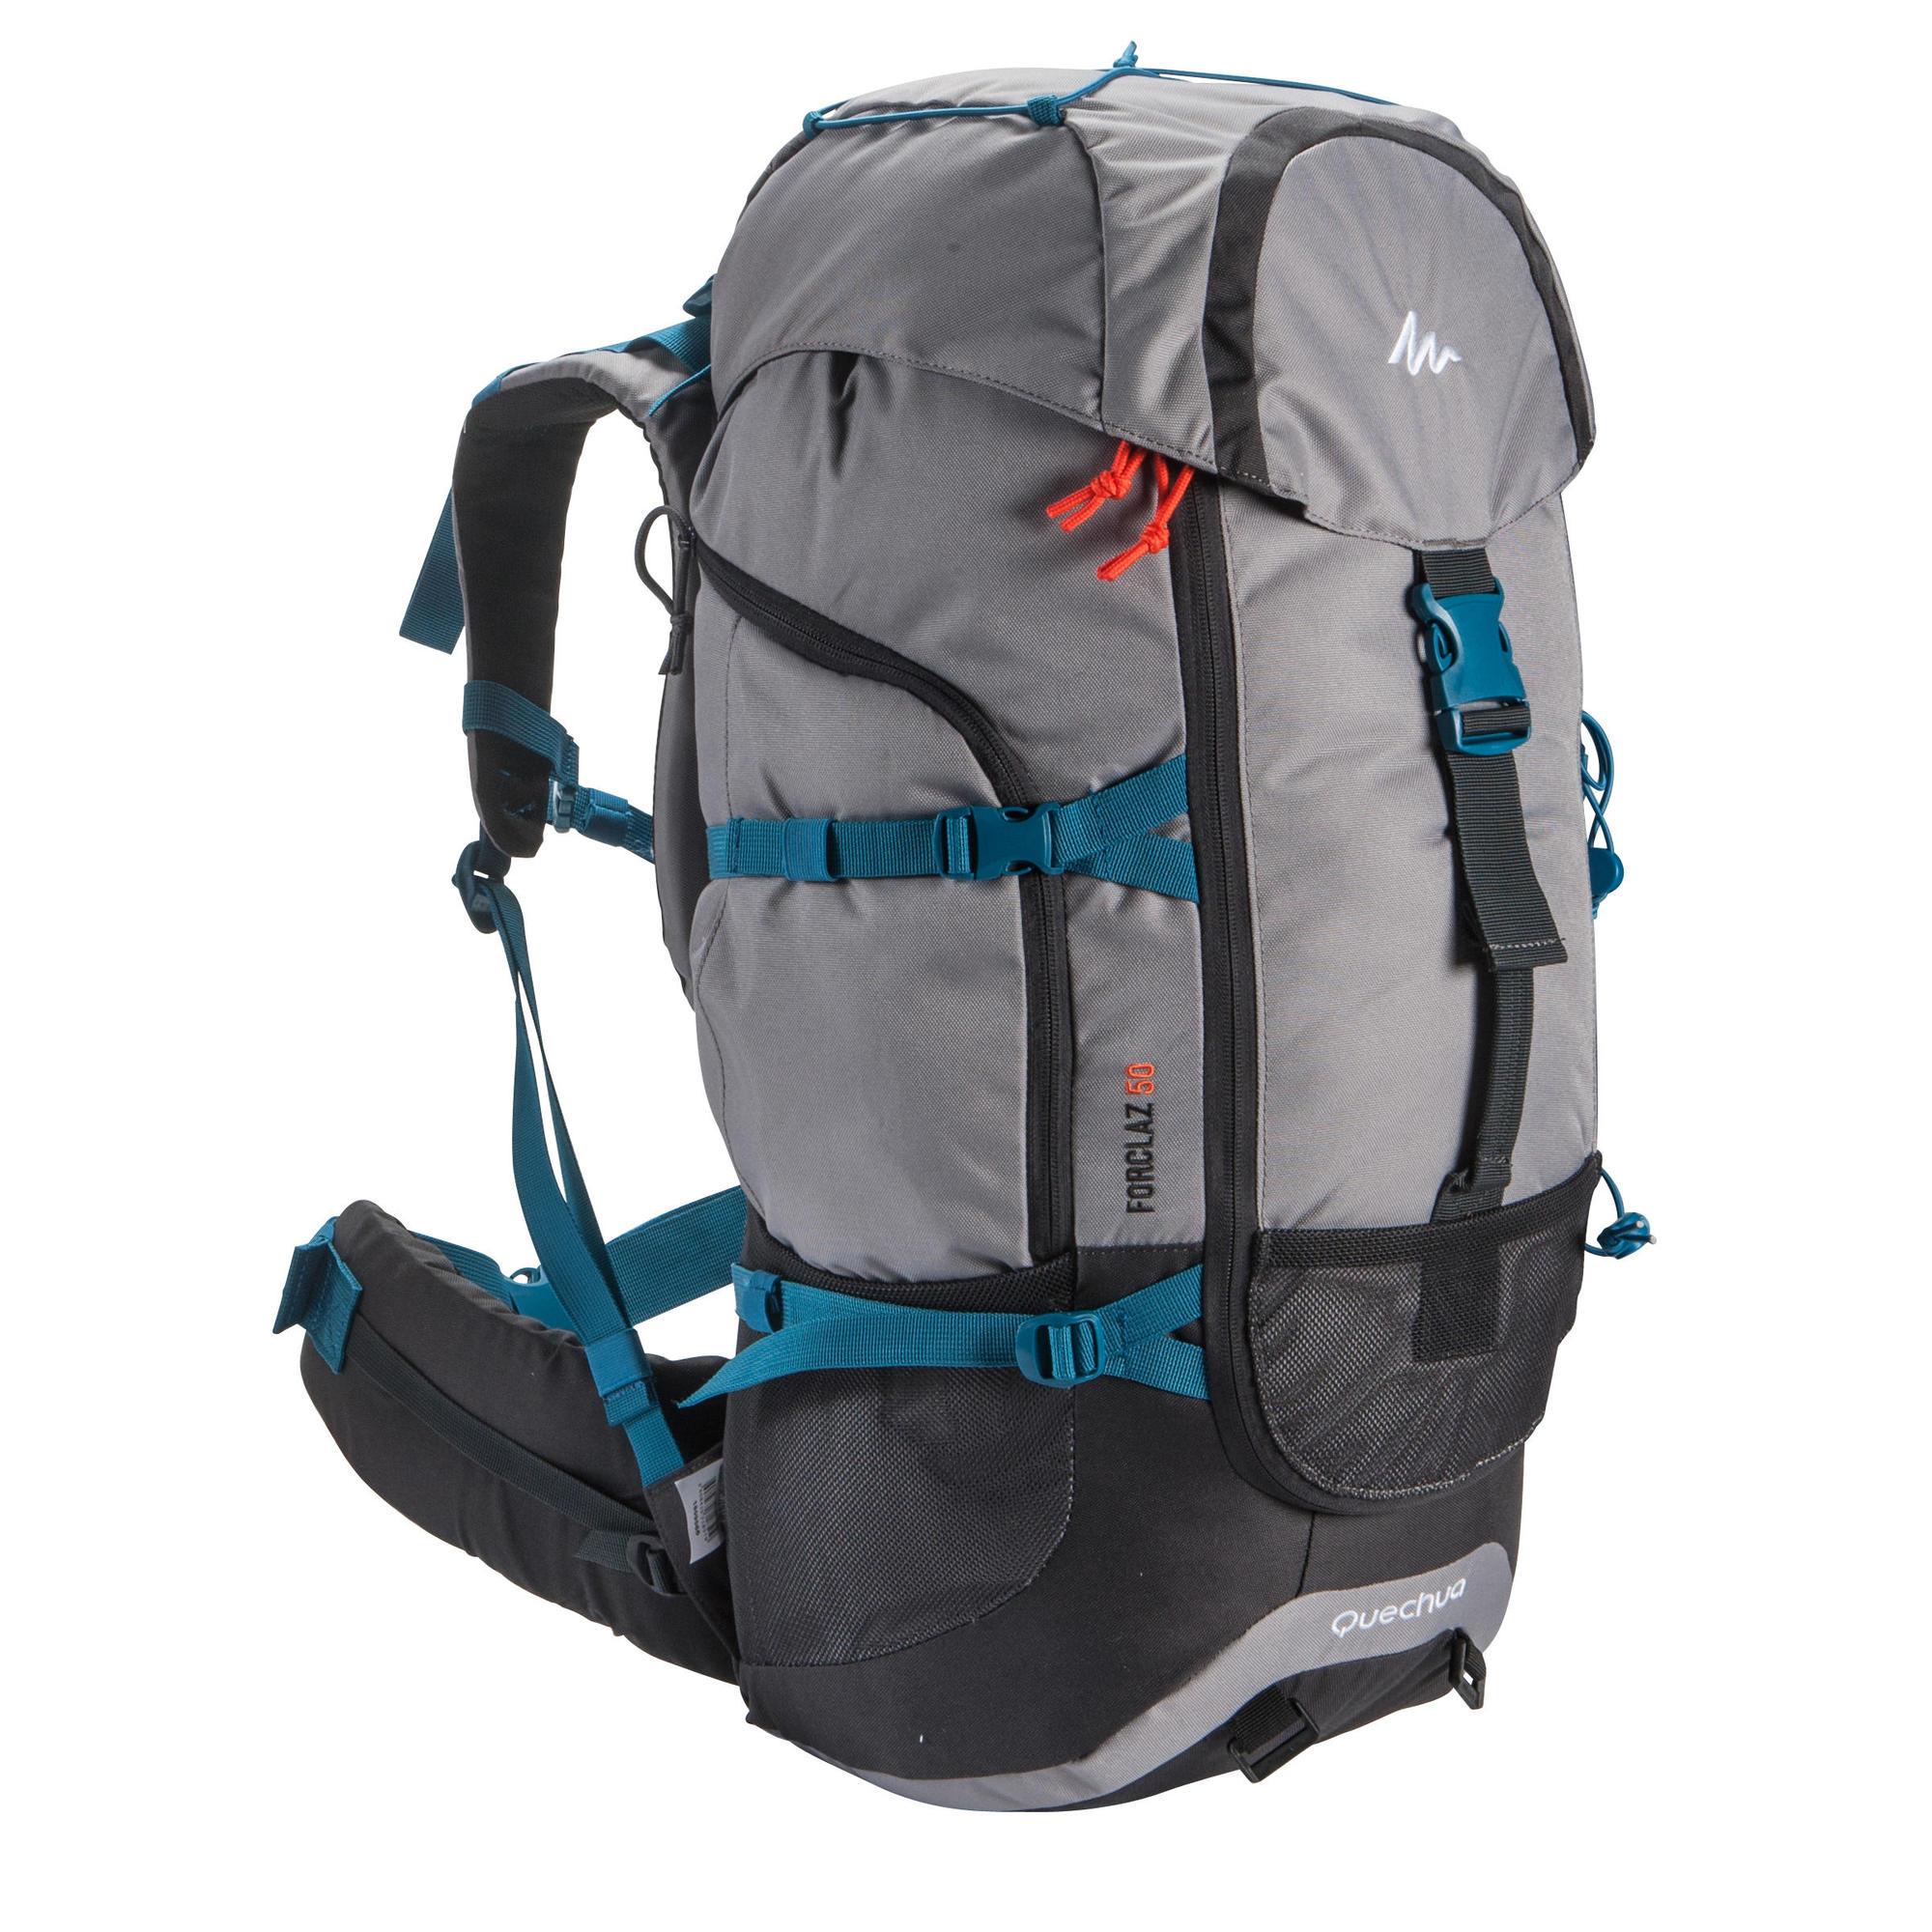 sac dos trekking forclaz 50 litres gris quechua. Black Bedroom Furniture Sets. Home Design Ideas